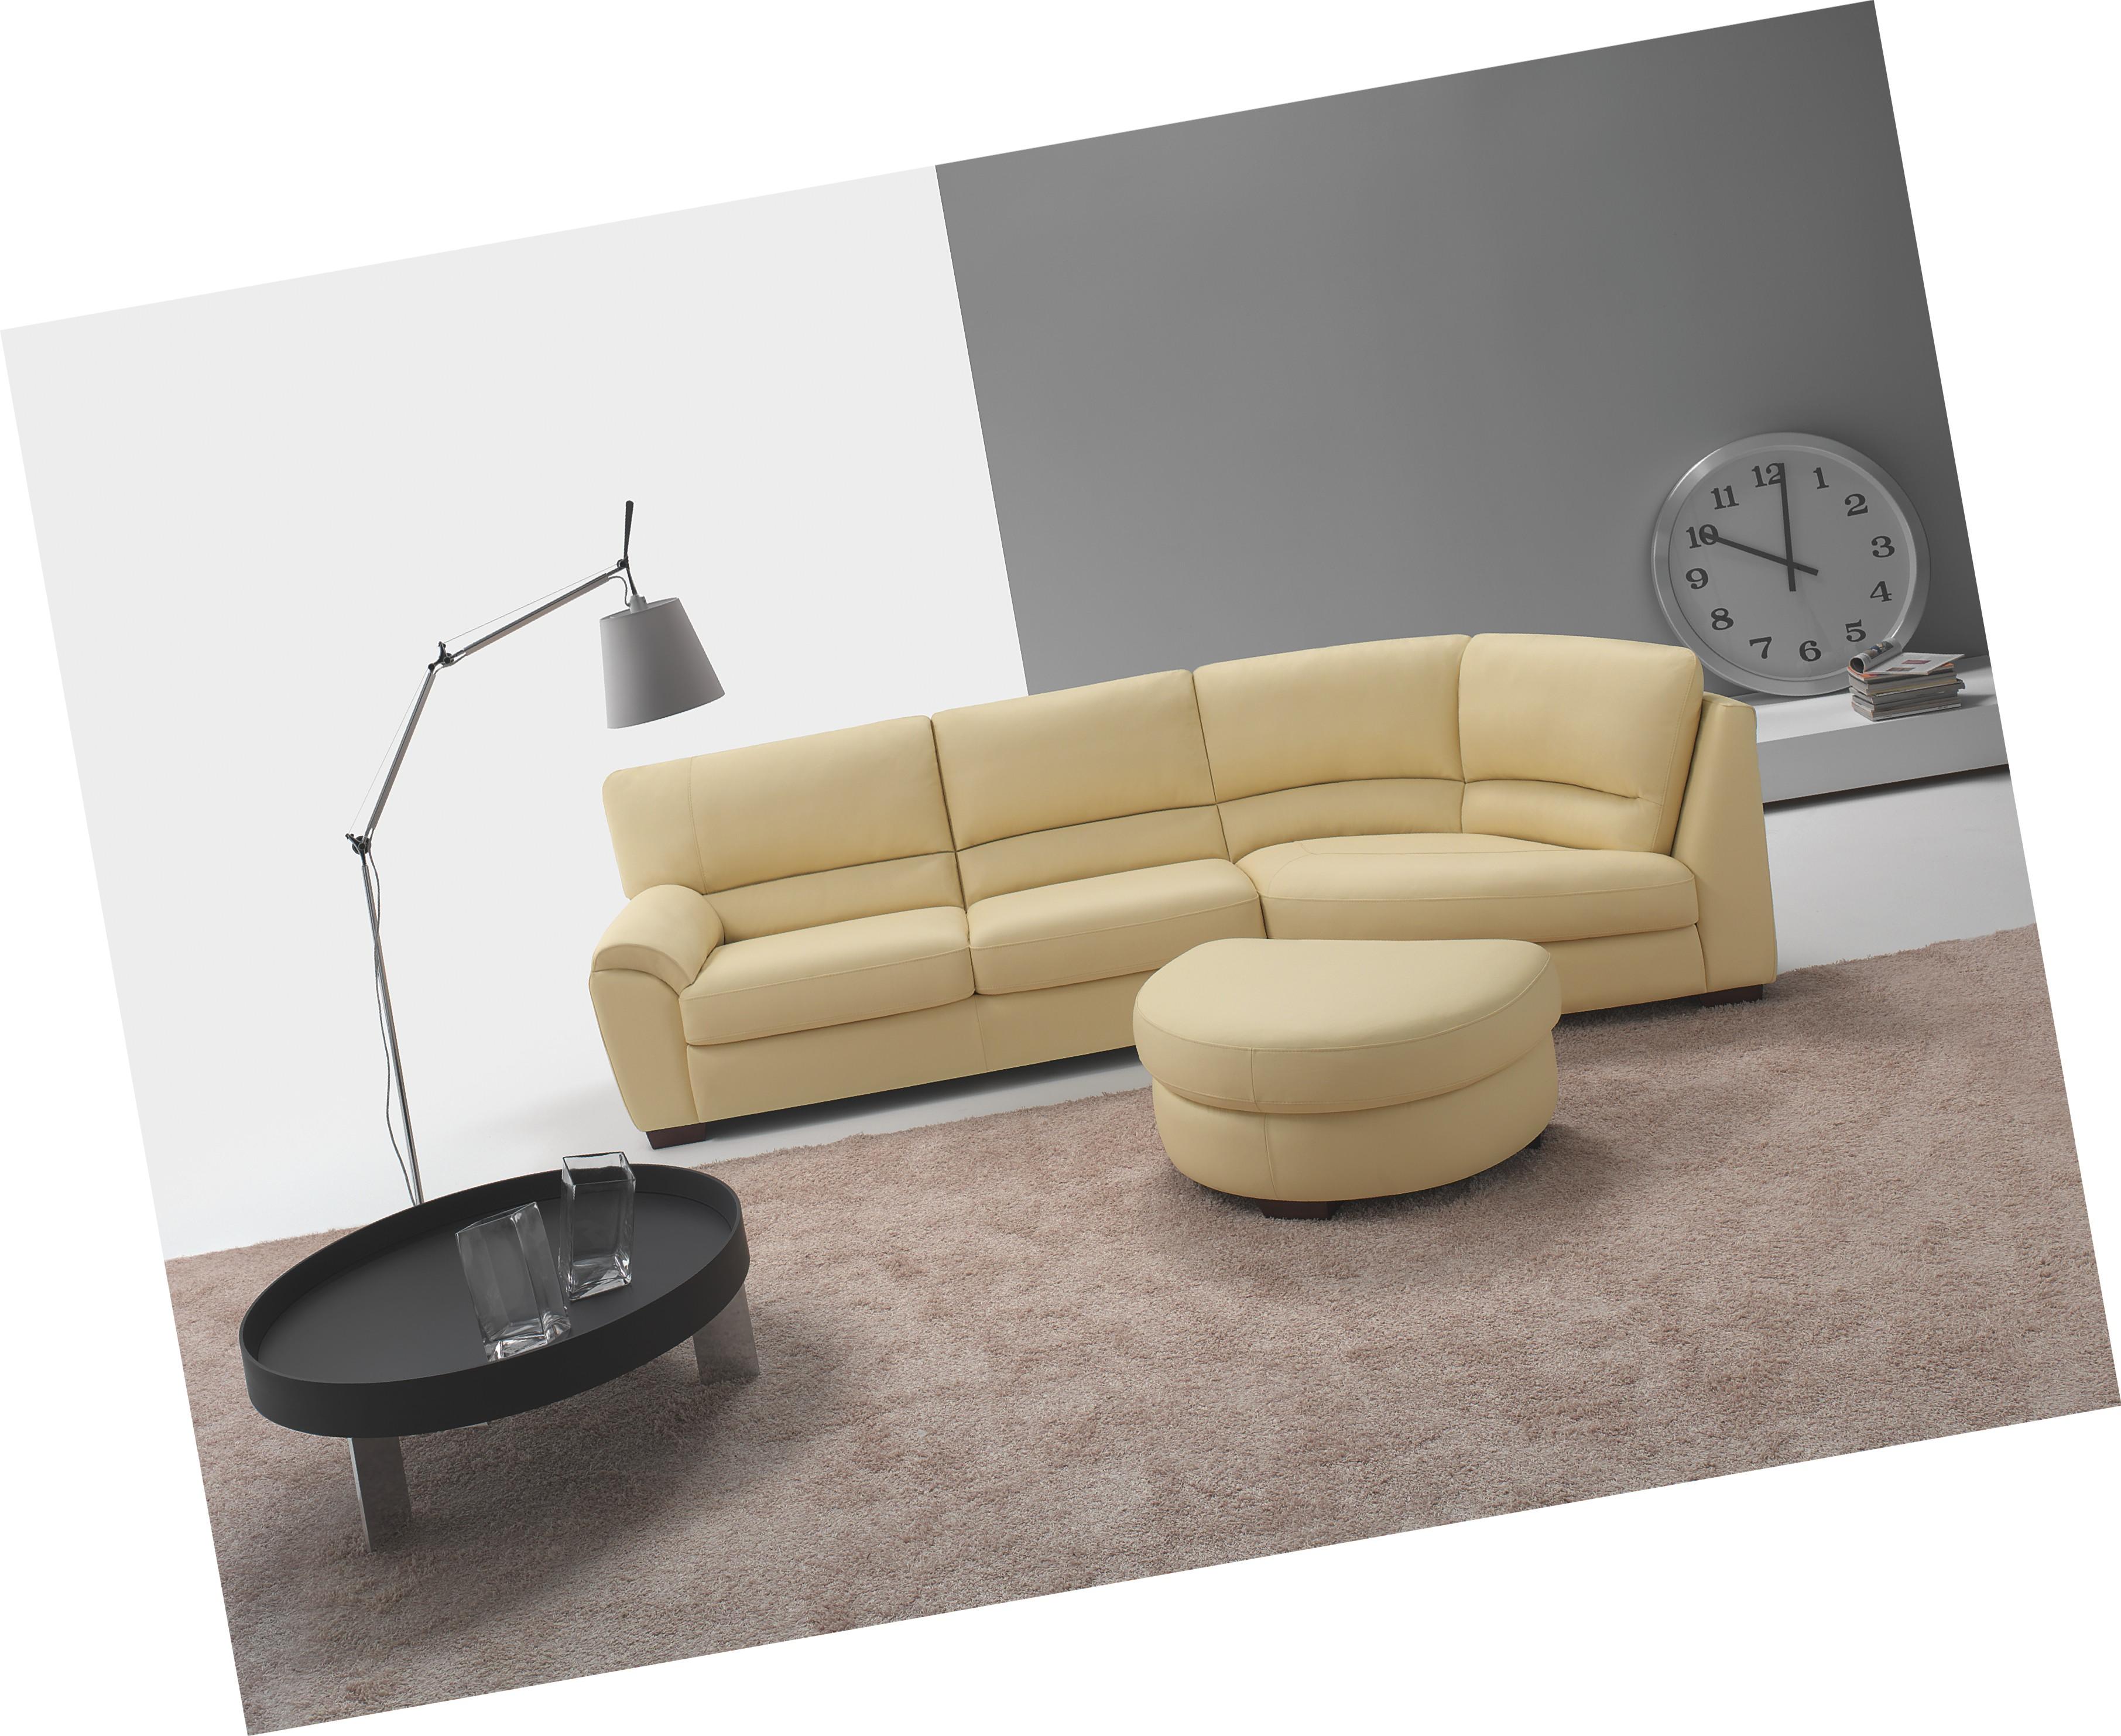 Divani Design 2000.Design 2000 Divani Opinioni Damesmodebarendrecht